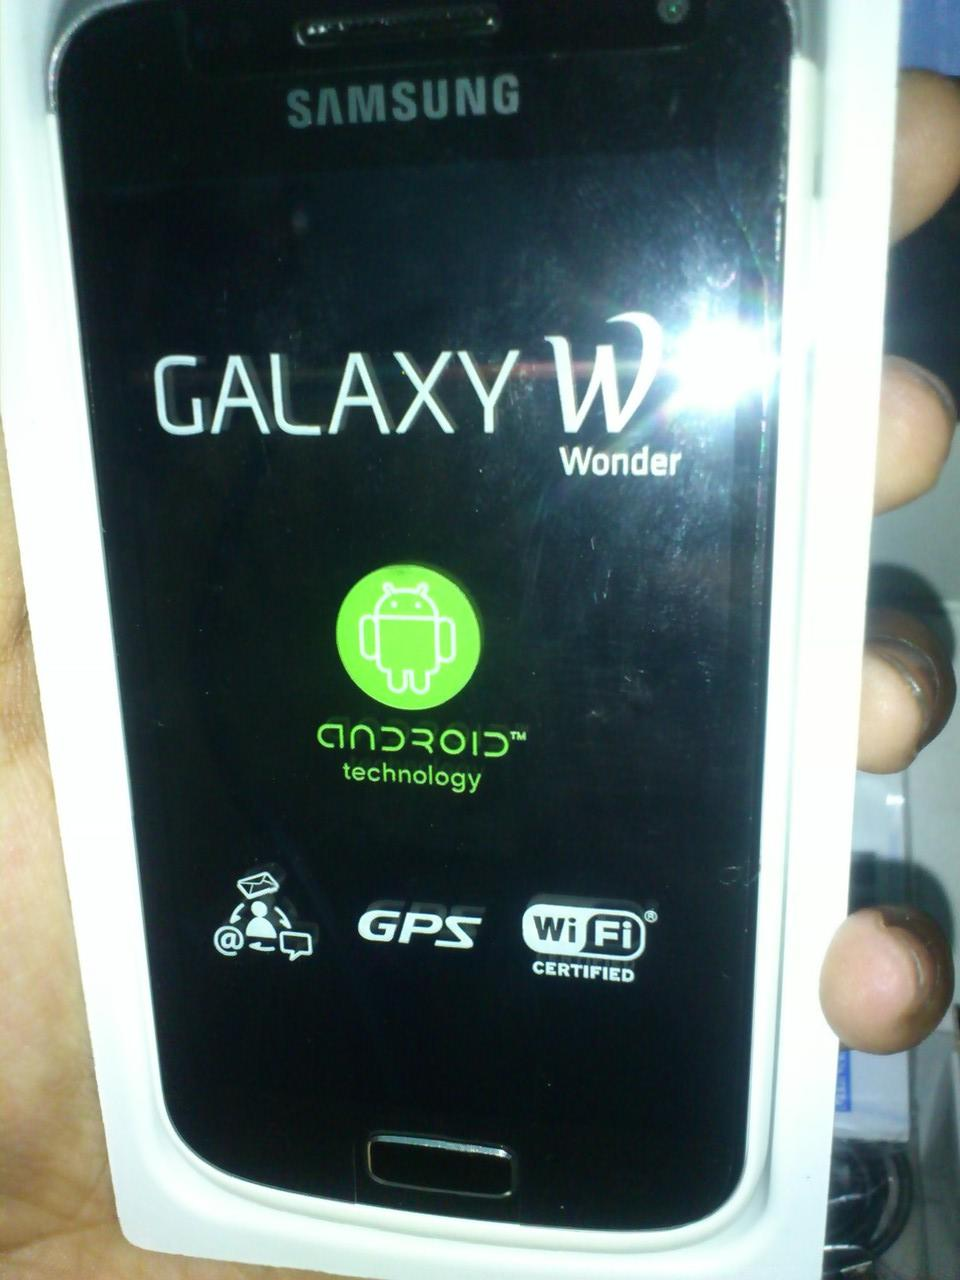 Samsung Galaxy Wonder (W) i8150 White [new]